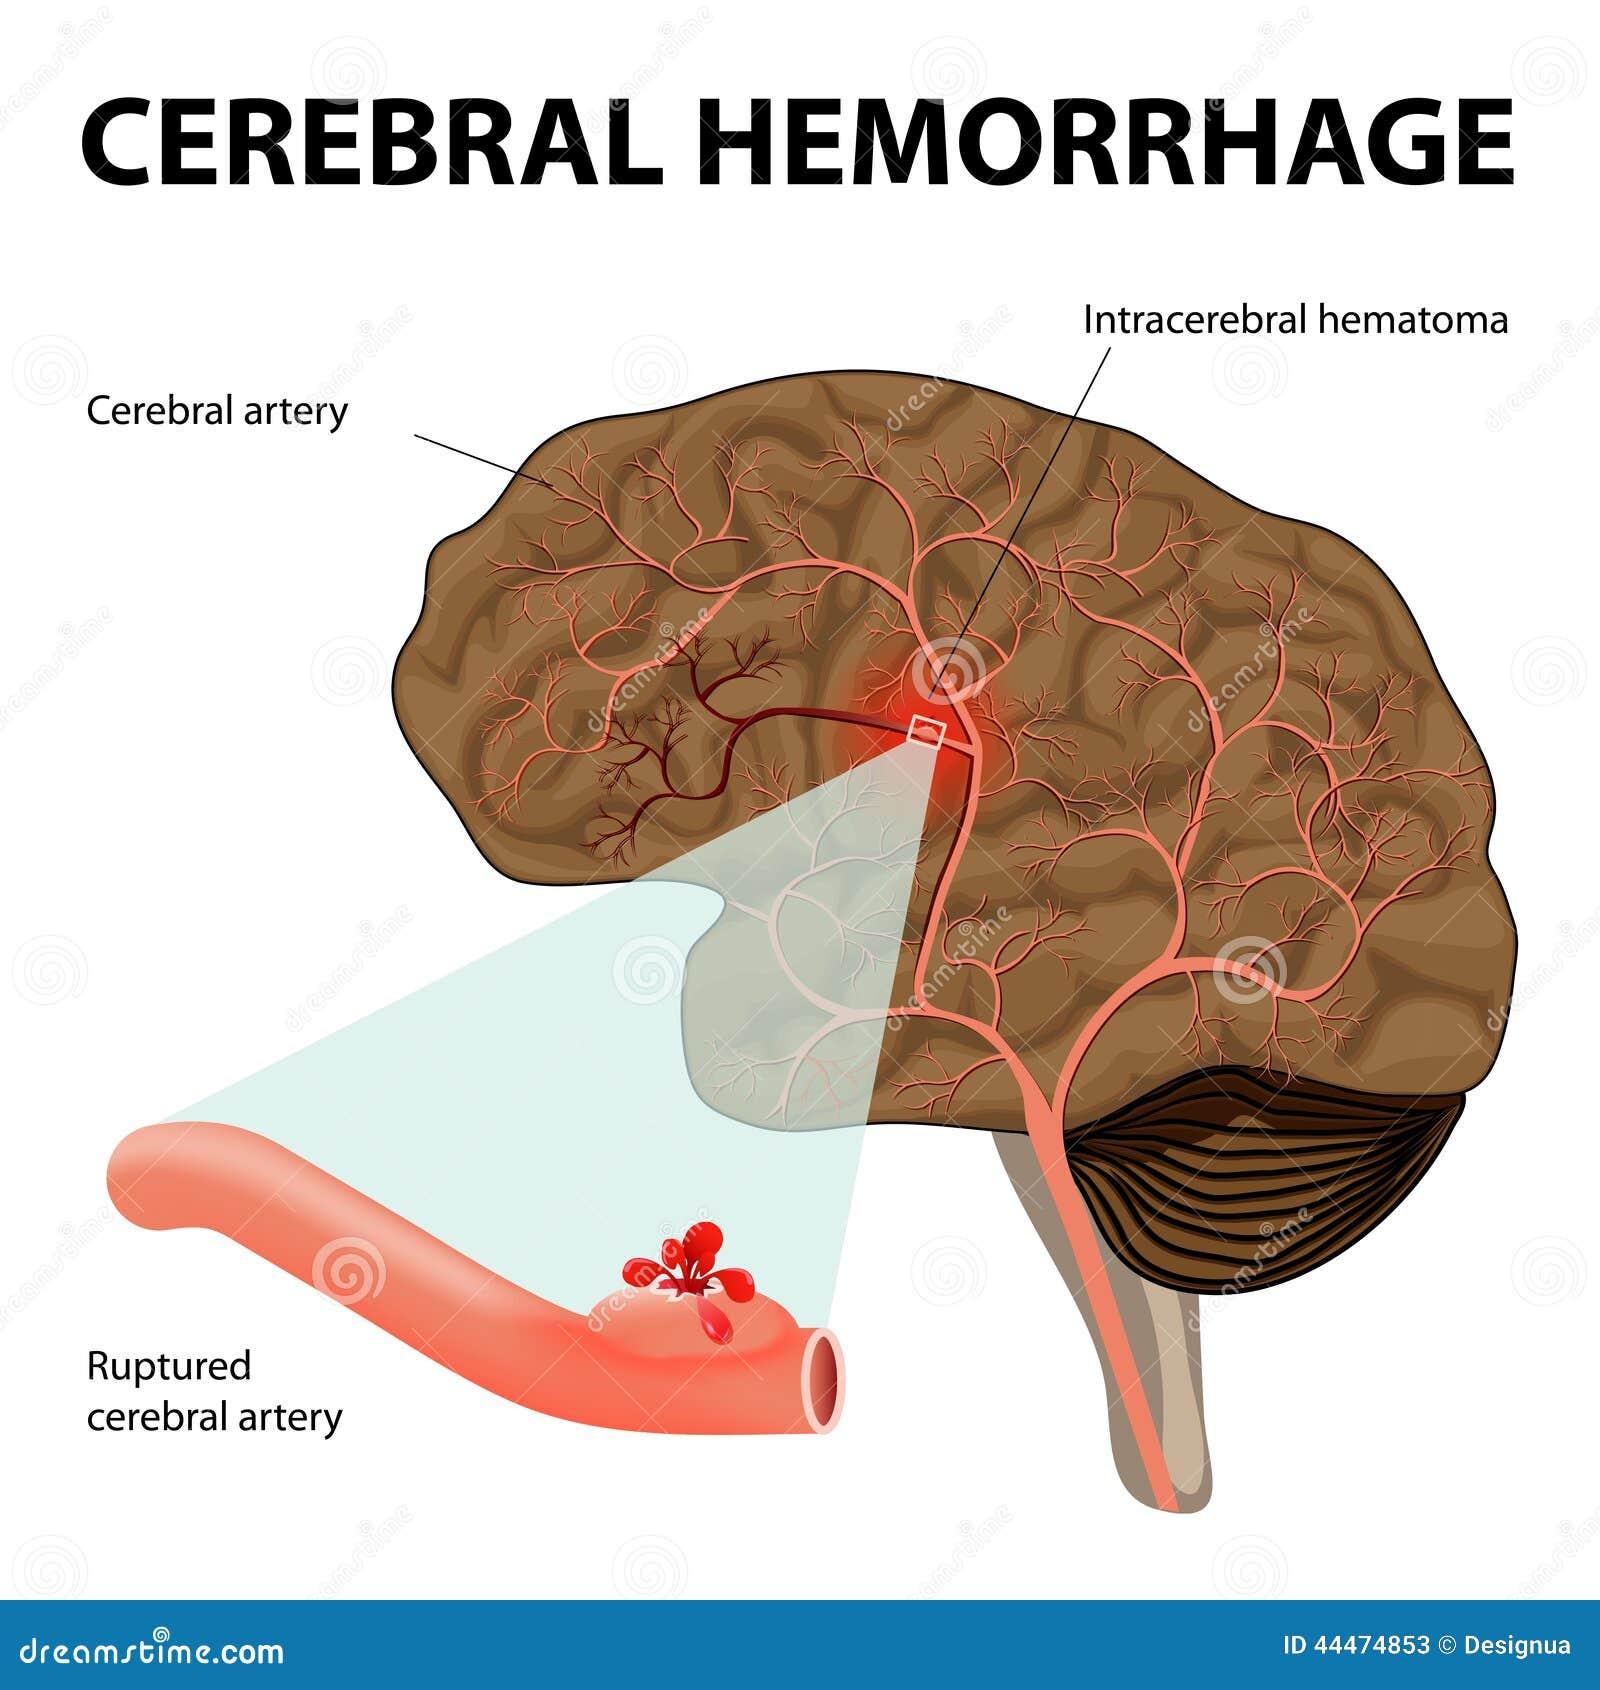 Cerebral hemorrhage stock vector. Illustration of anatomy - 44474853